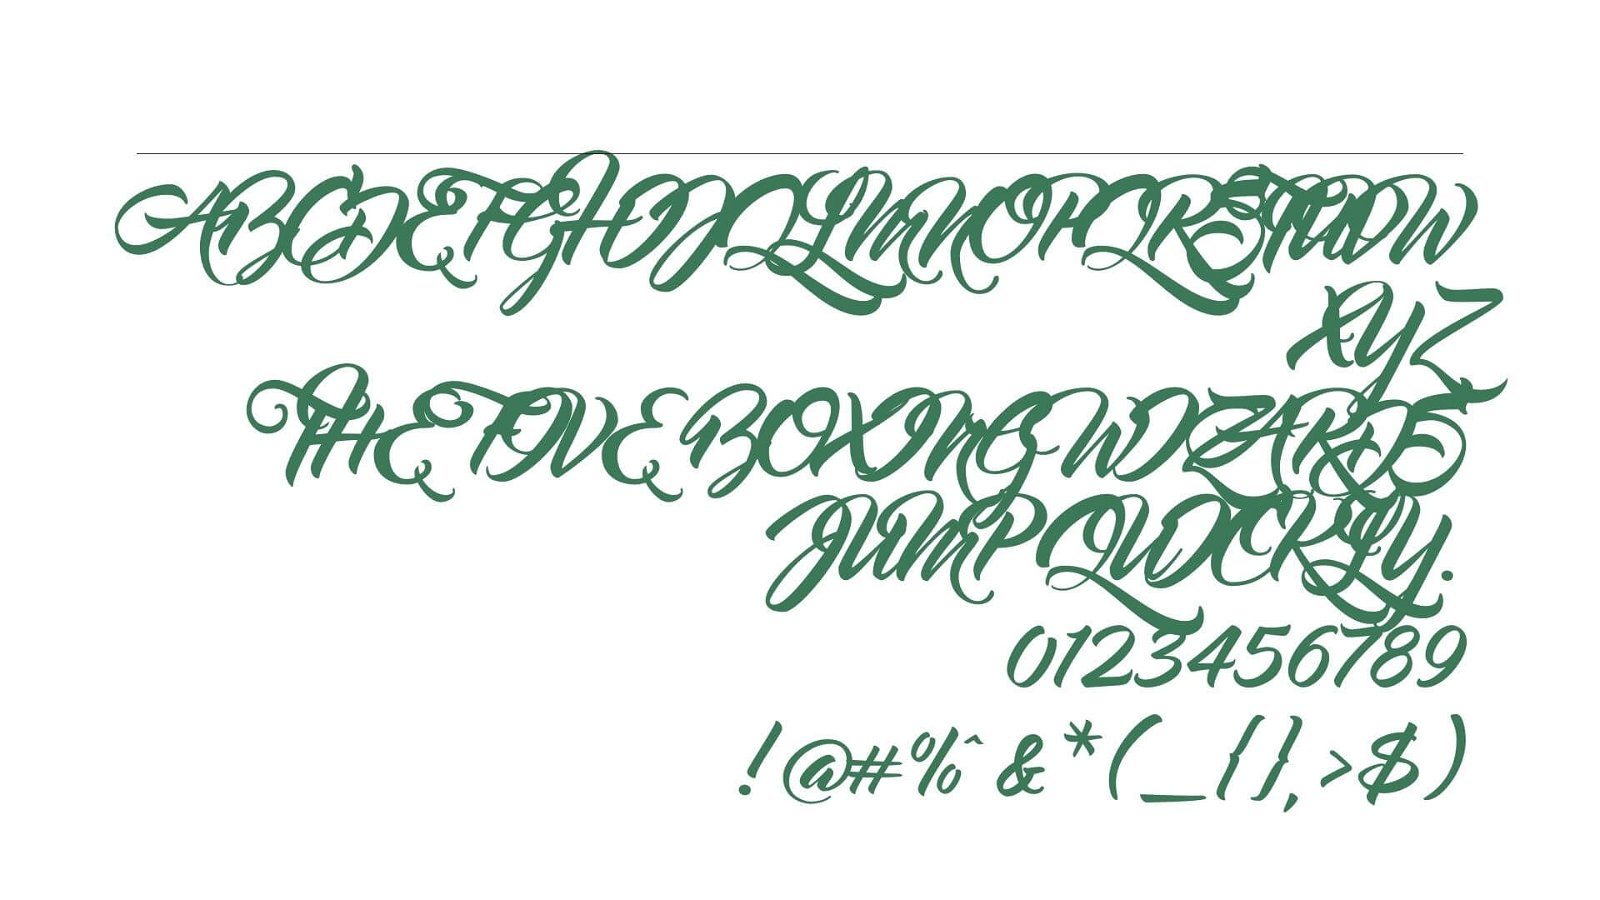 Master of Break Font View - Master of Break Font Free Download